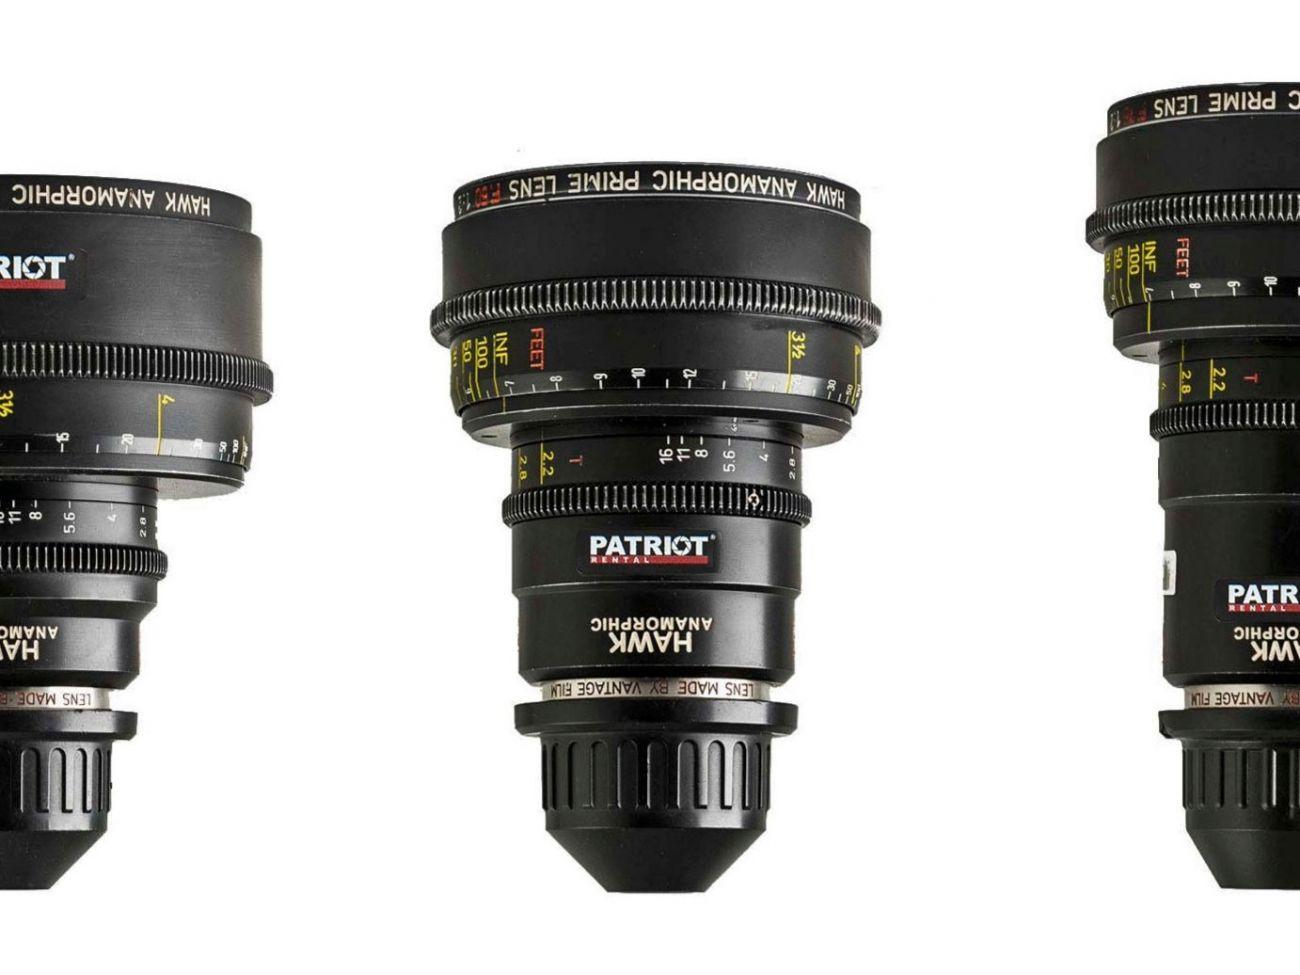 SET HAWK C-SERIES ANAMORPHIC Lenses T2.2-3.6 PL 35,50,75,100,135mm